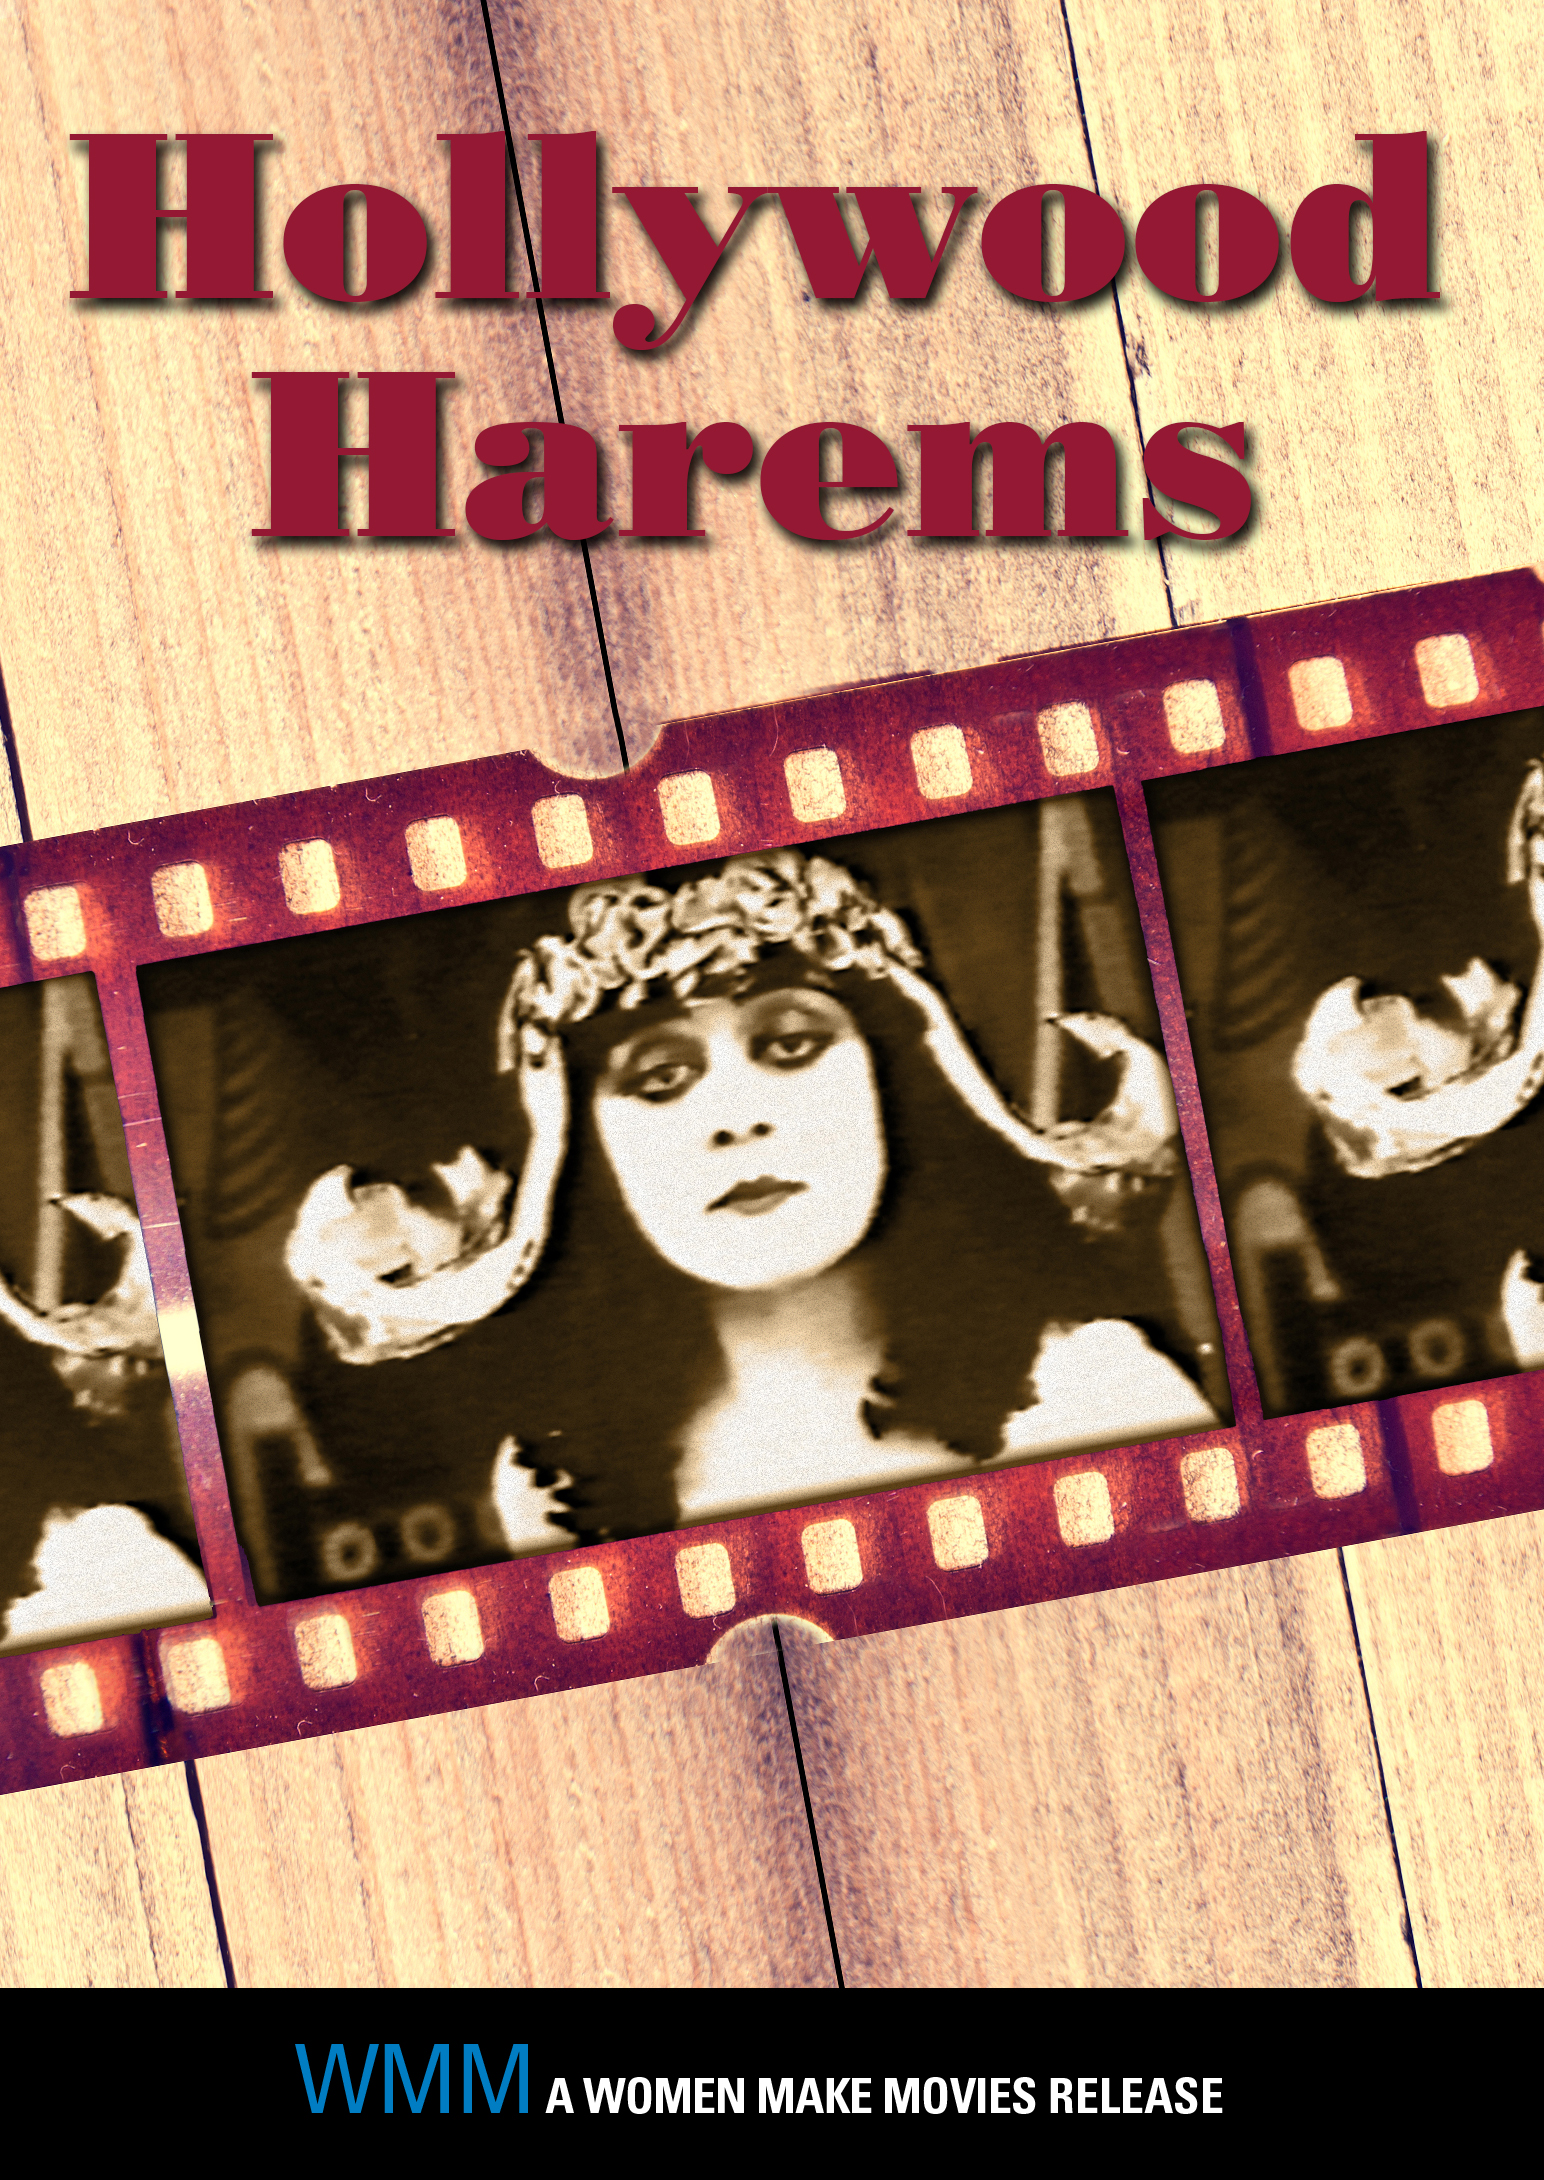 American Taboo Movie hollywood harems | women make movies